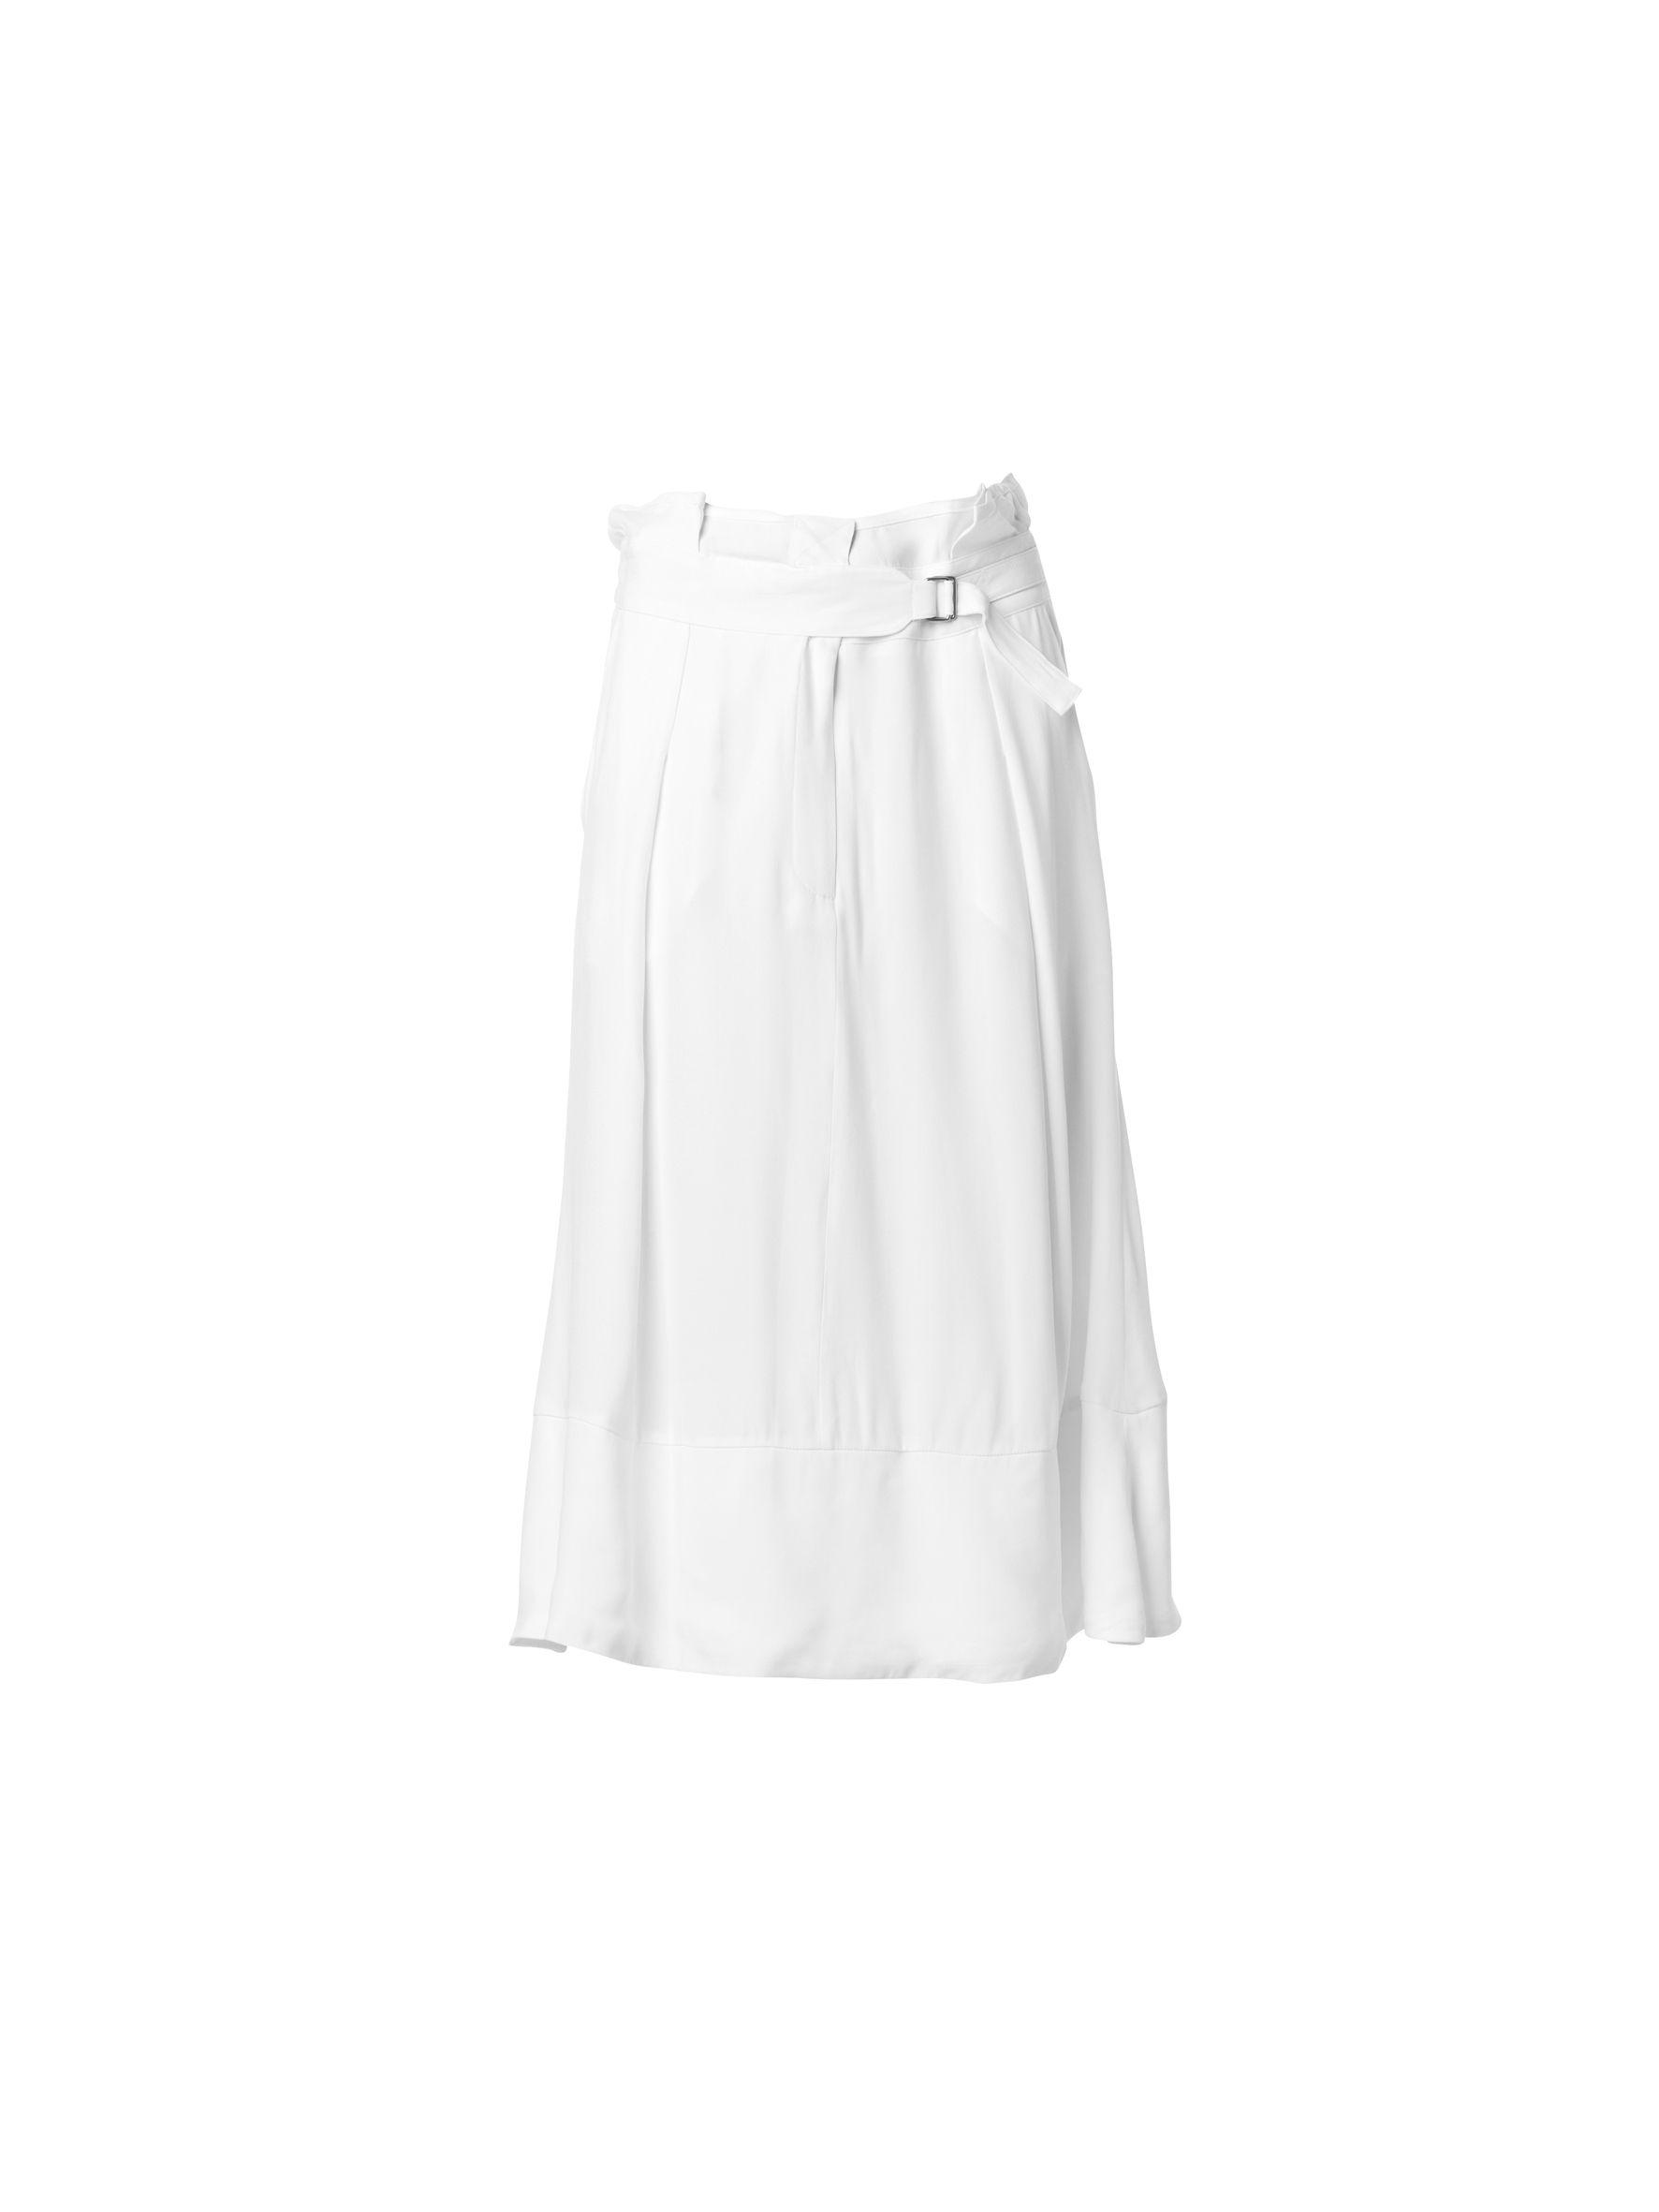 Coline Skirt - By Malene Birger Spring Summer 2015 - Women's fashion